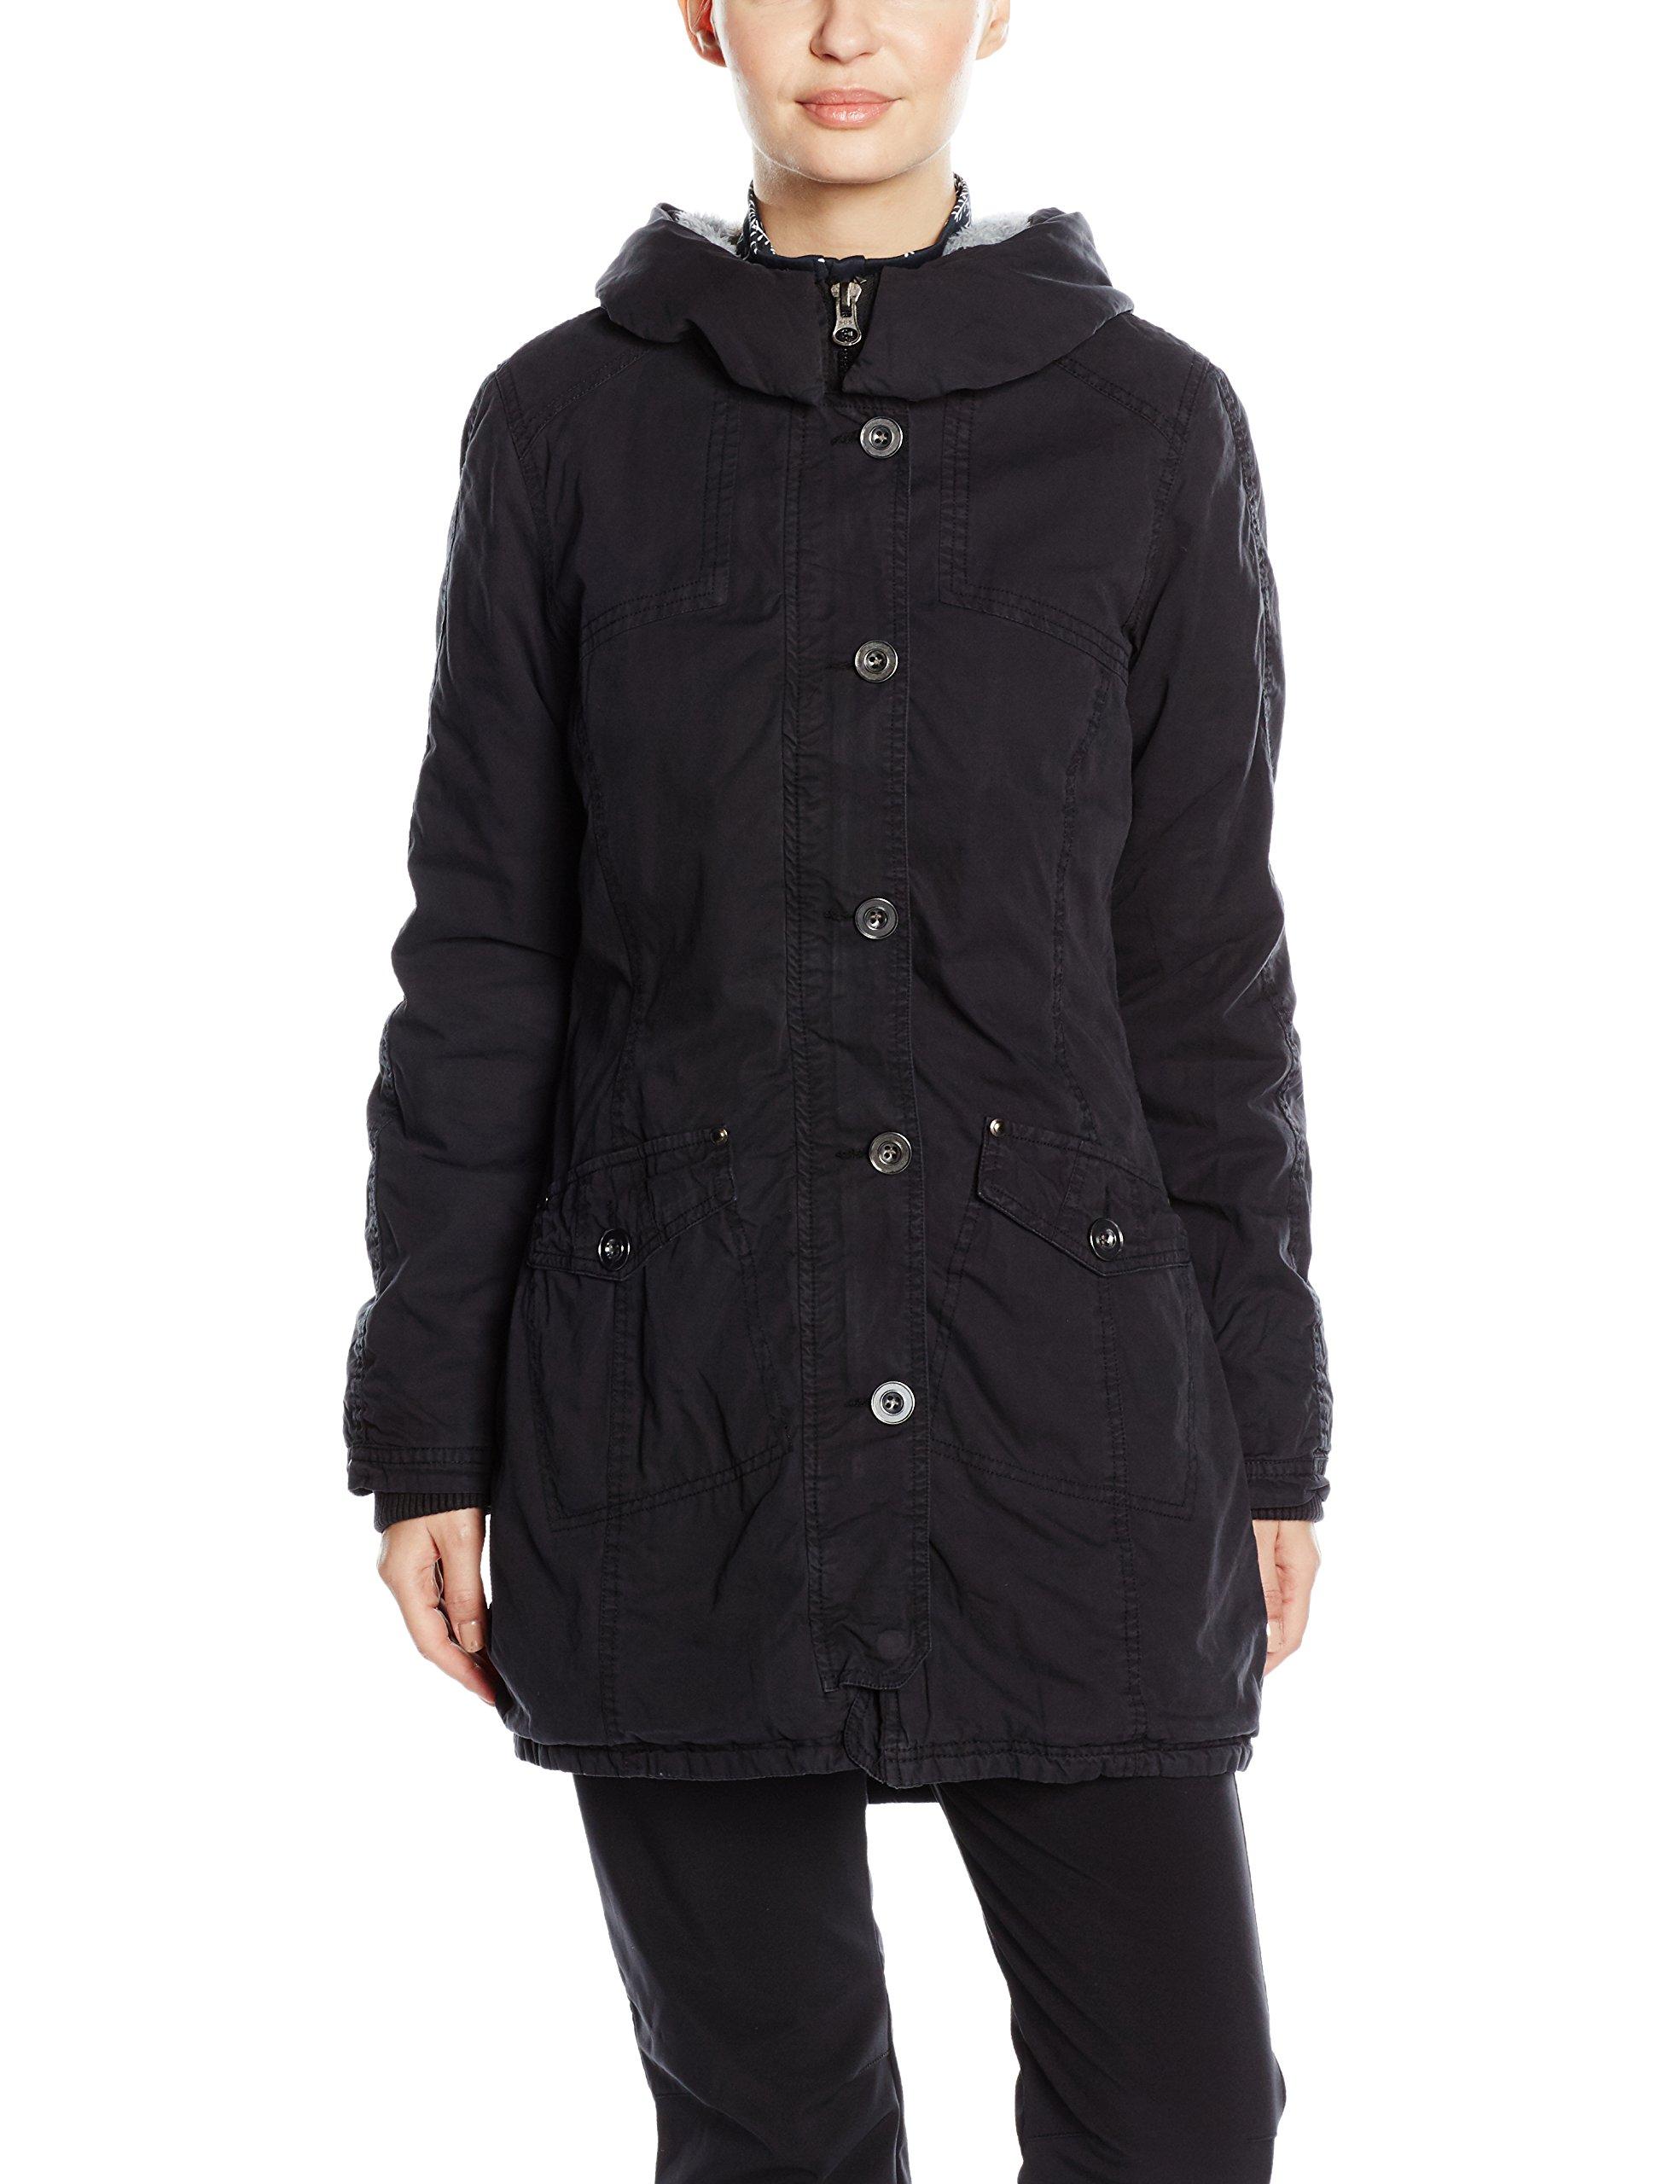 Blouson Washed Classics Parka FemmeNoirschwarzTaille small Long Jacke Garment Urban FabricantX WD9HIeE2Y